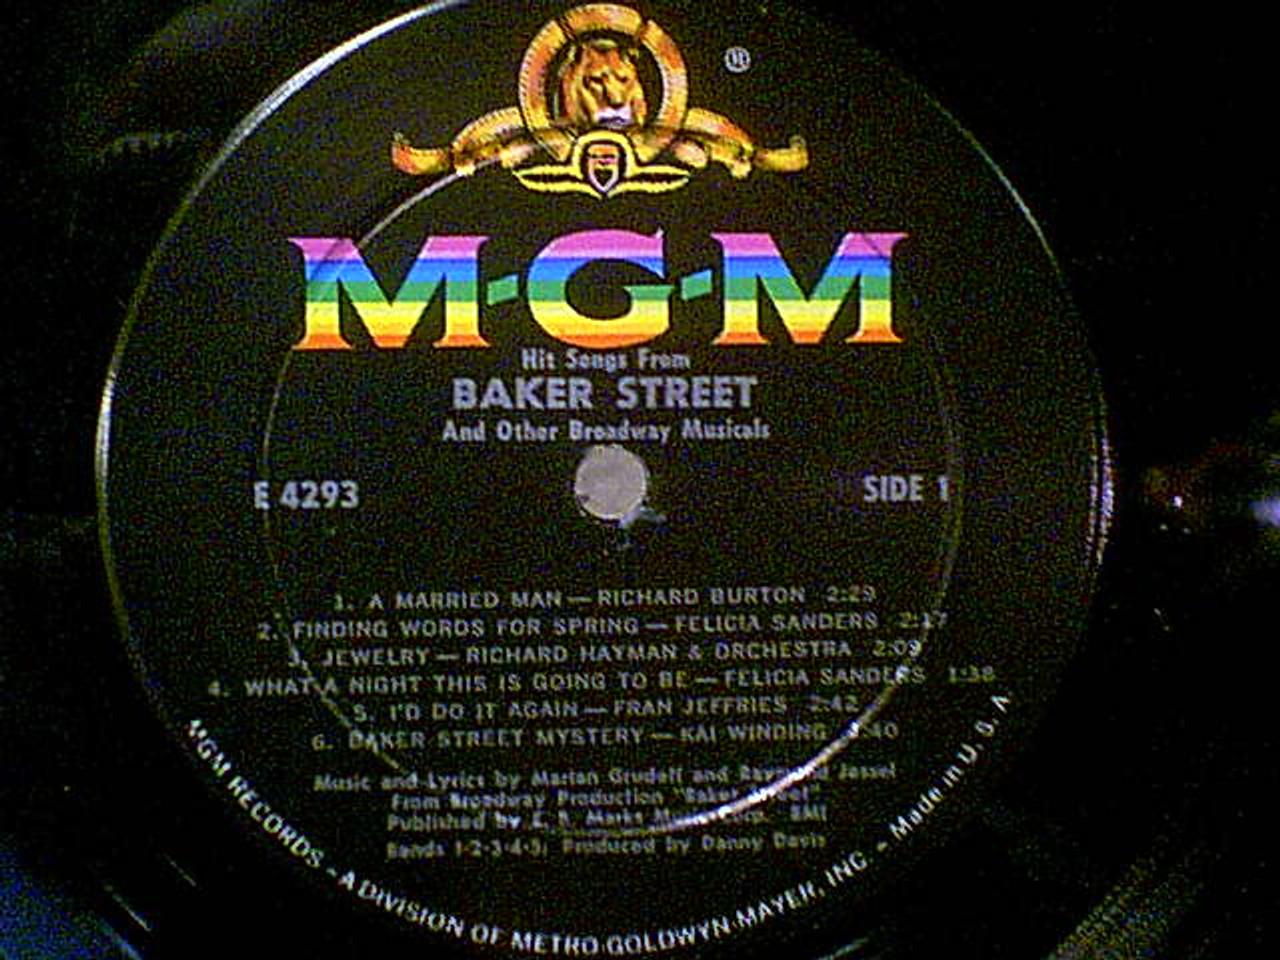 "Weaver, Fritz & Inga Swenson ""Hit Songs From Baker Street"" 1966 LP Signed Autograph"